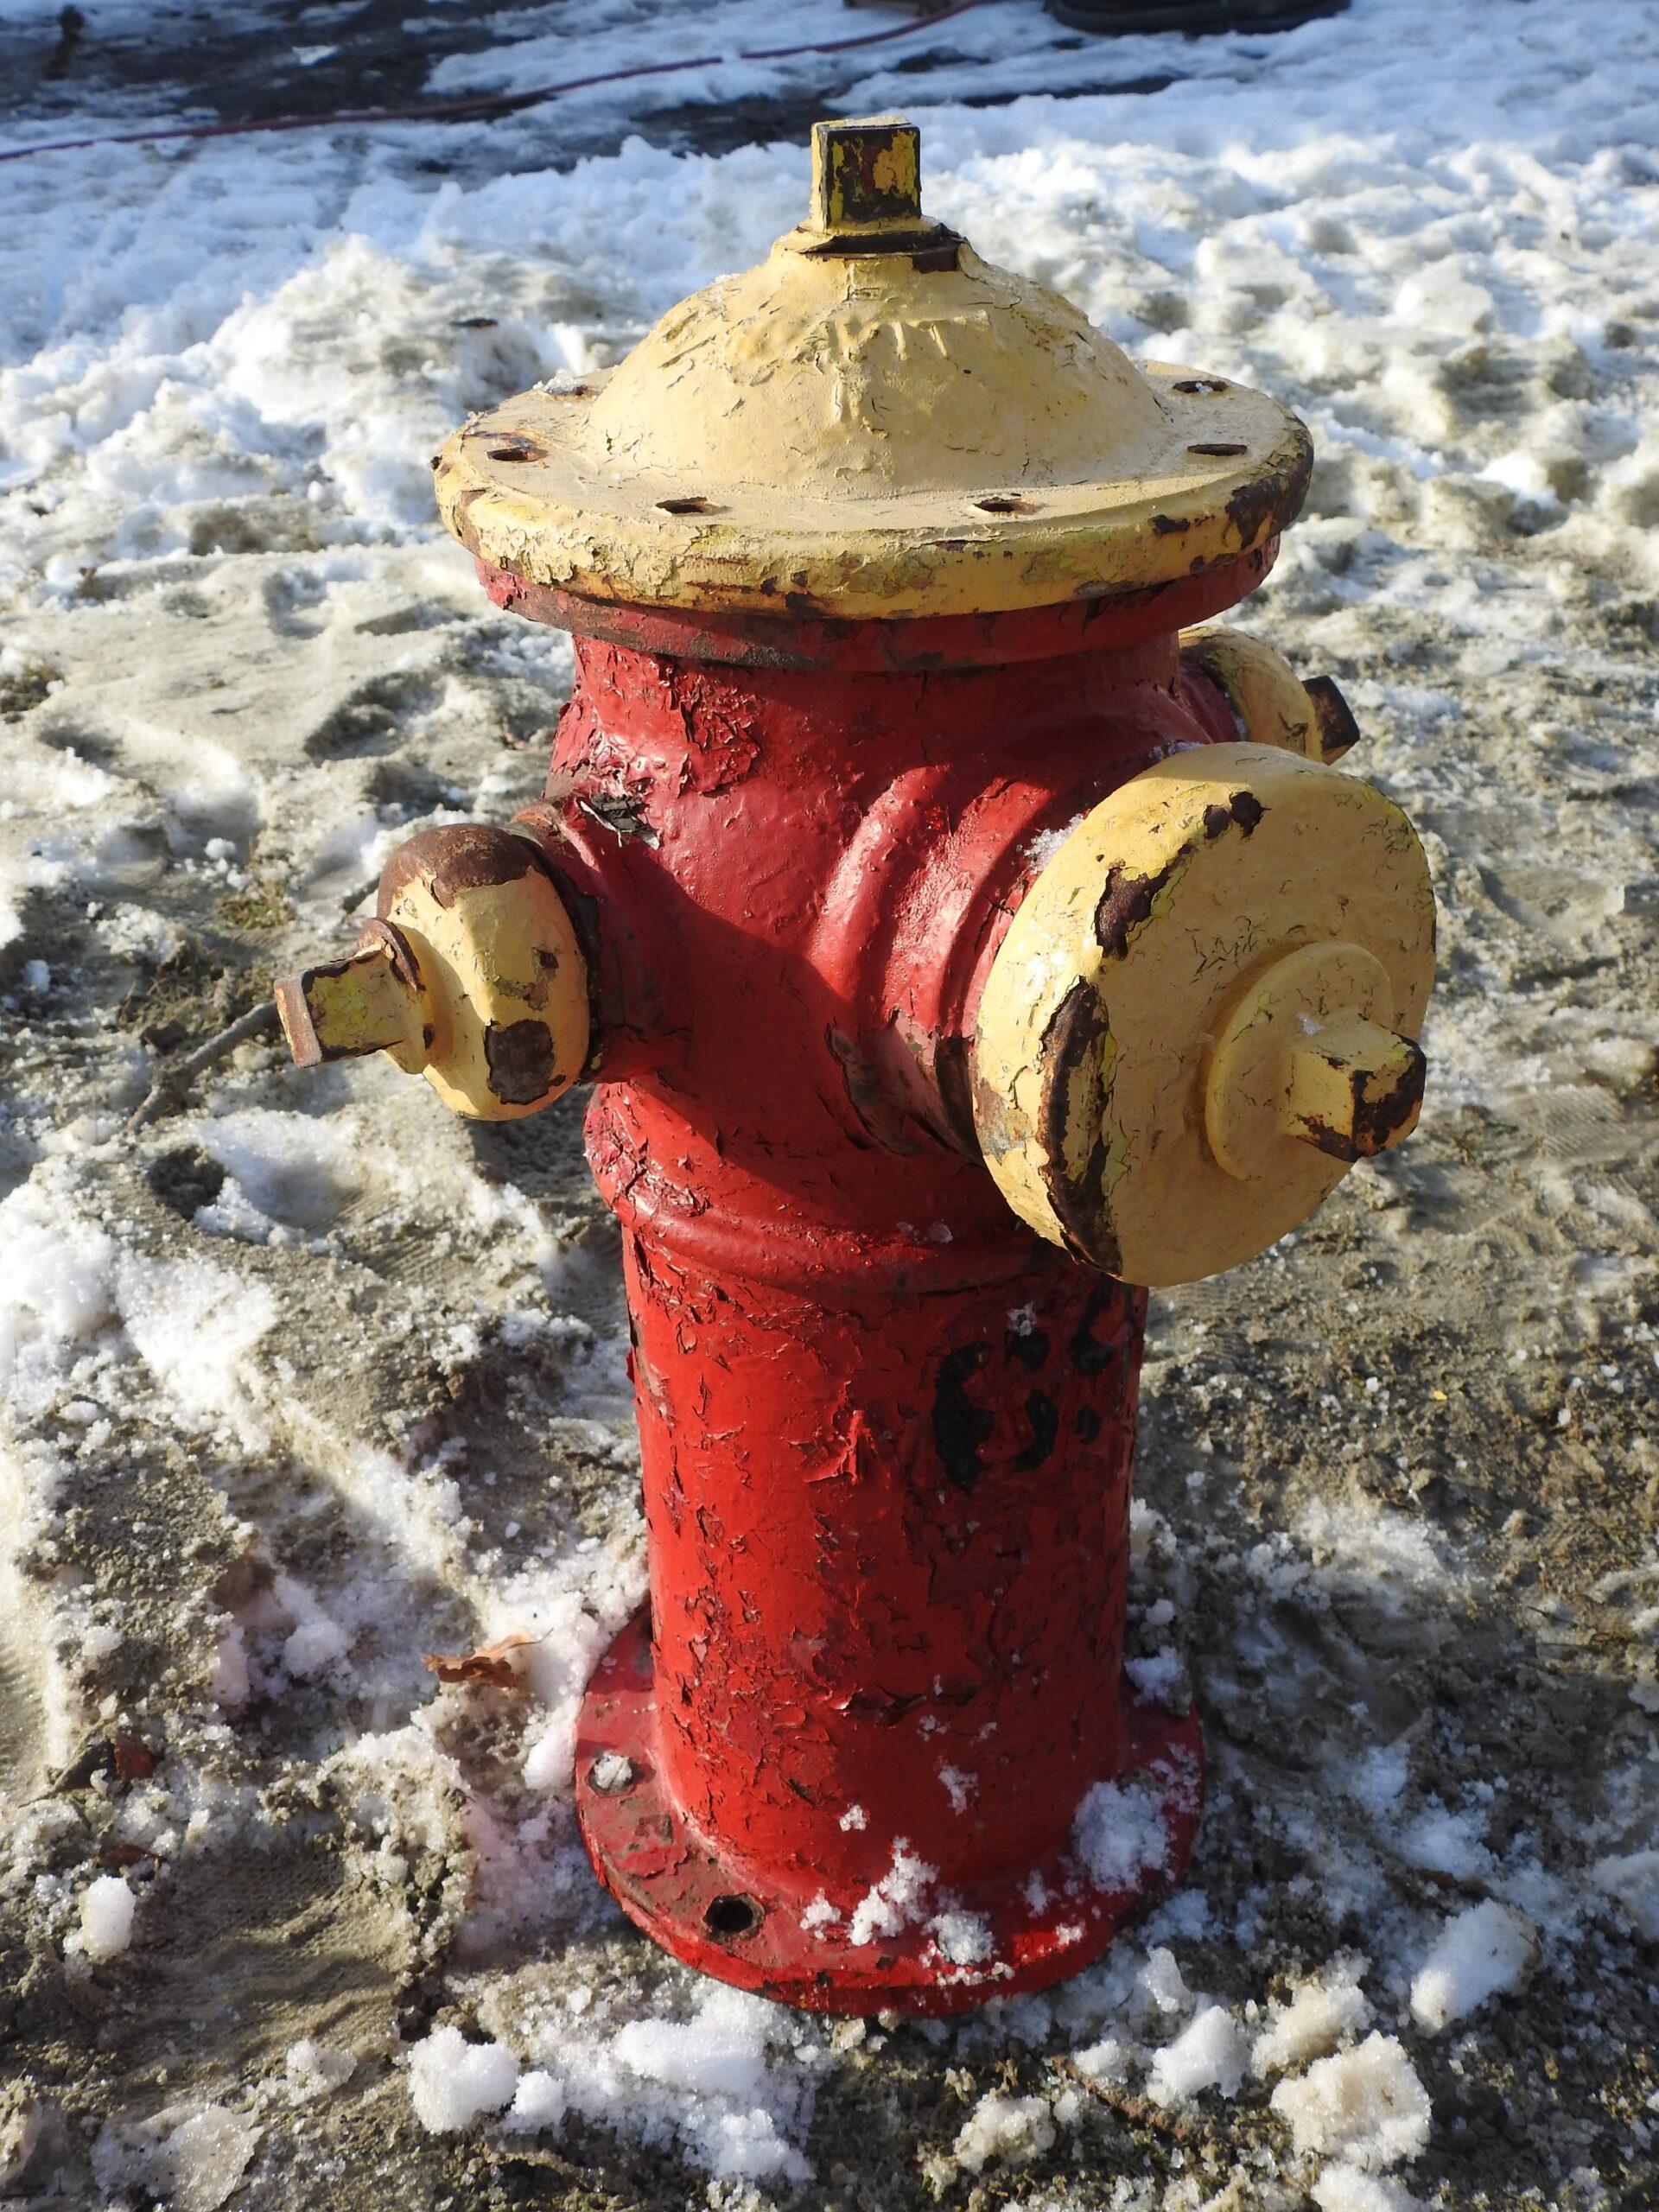 Maritime Blasting fire hydrant before